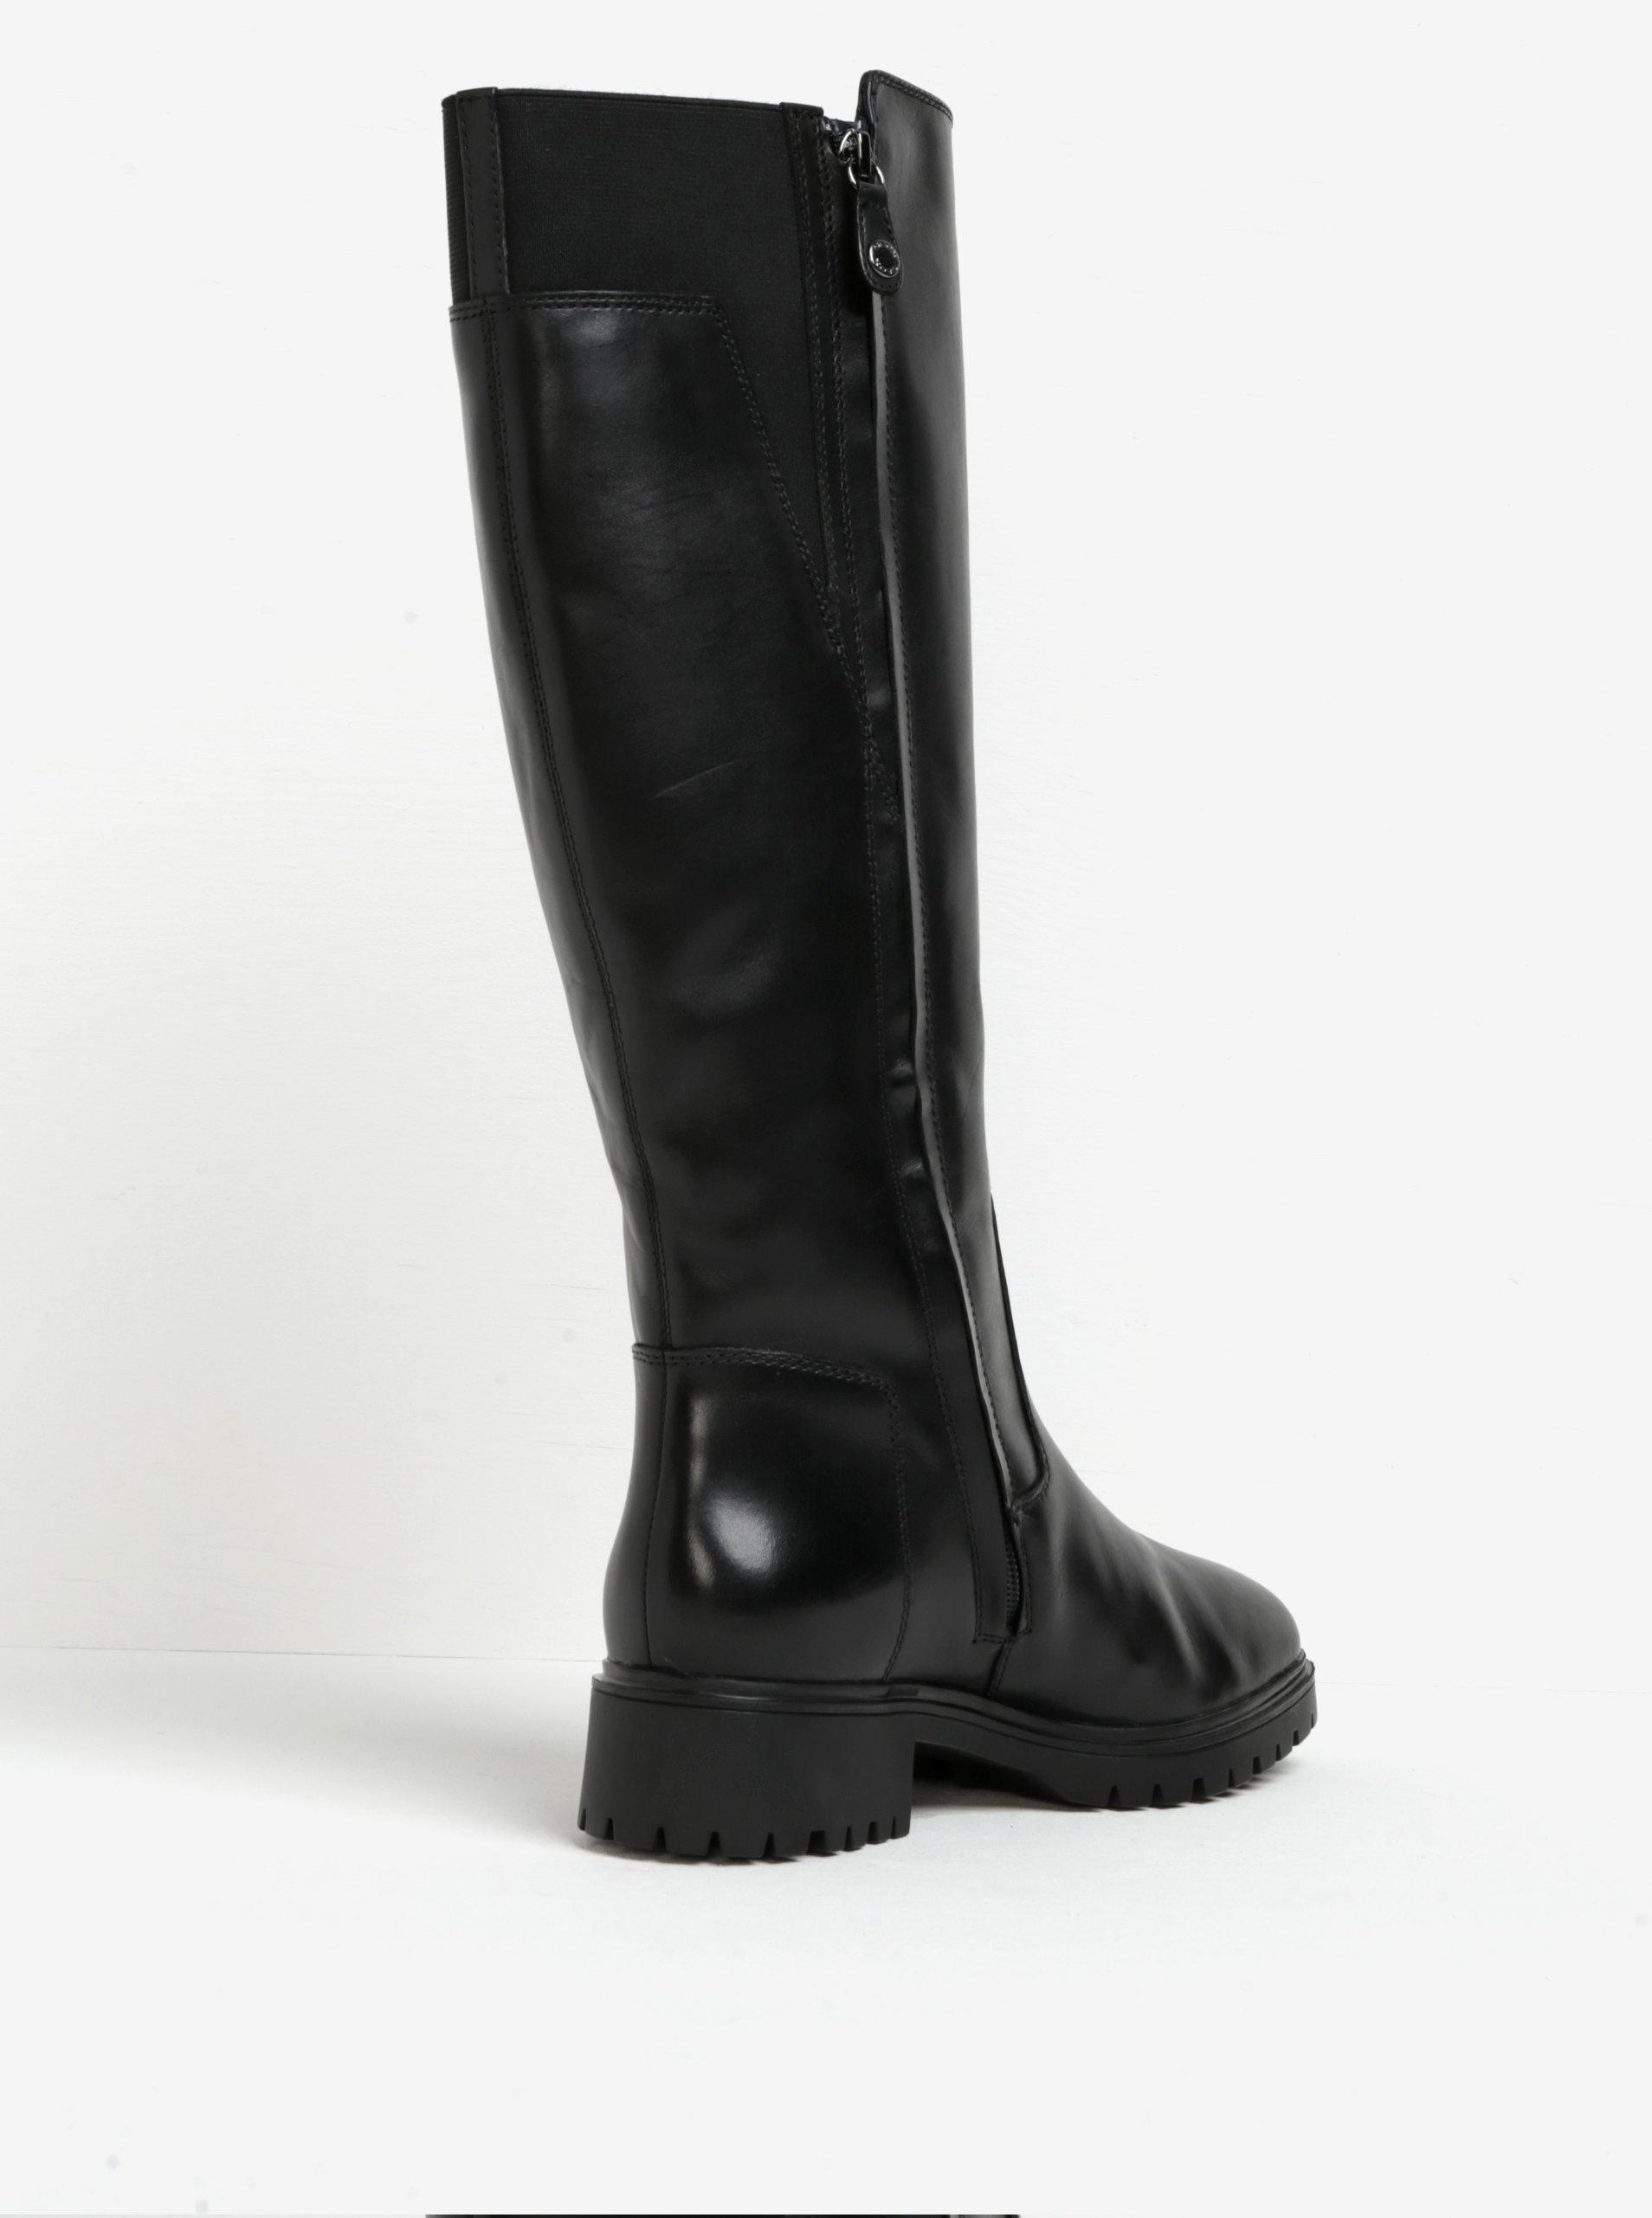 8fe14e4a6 Čierne zateplené kožené čižmy s gumenou vložkou Geox Peaceful | ZOOT.sk